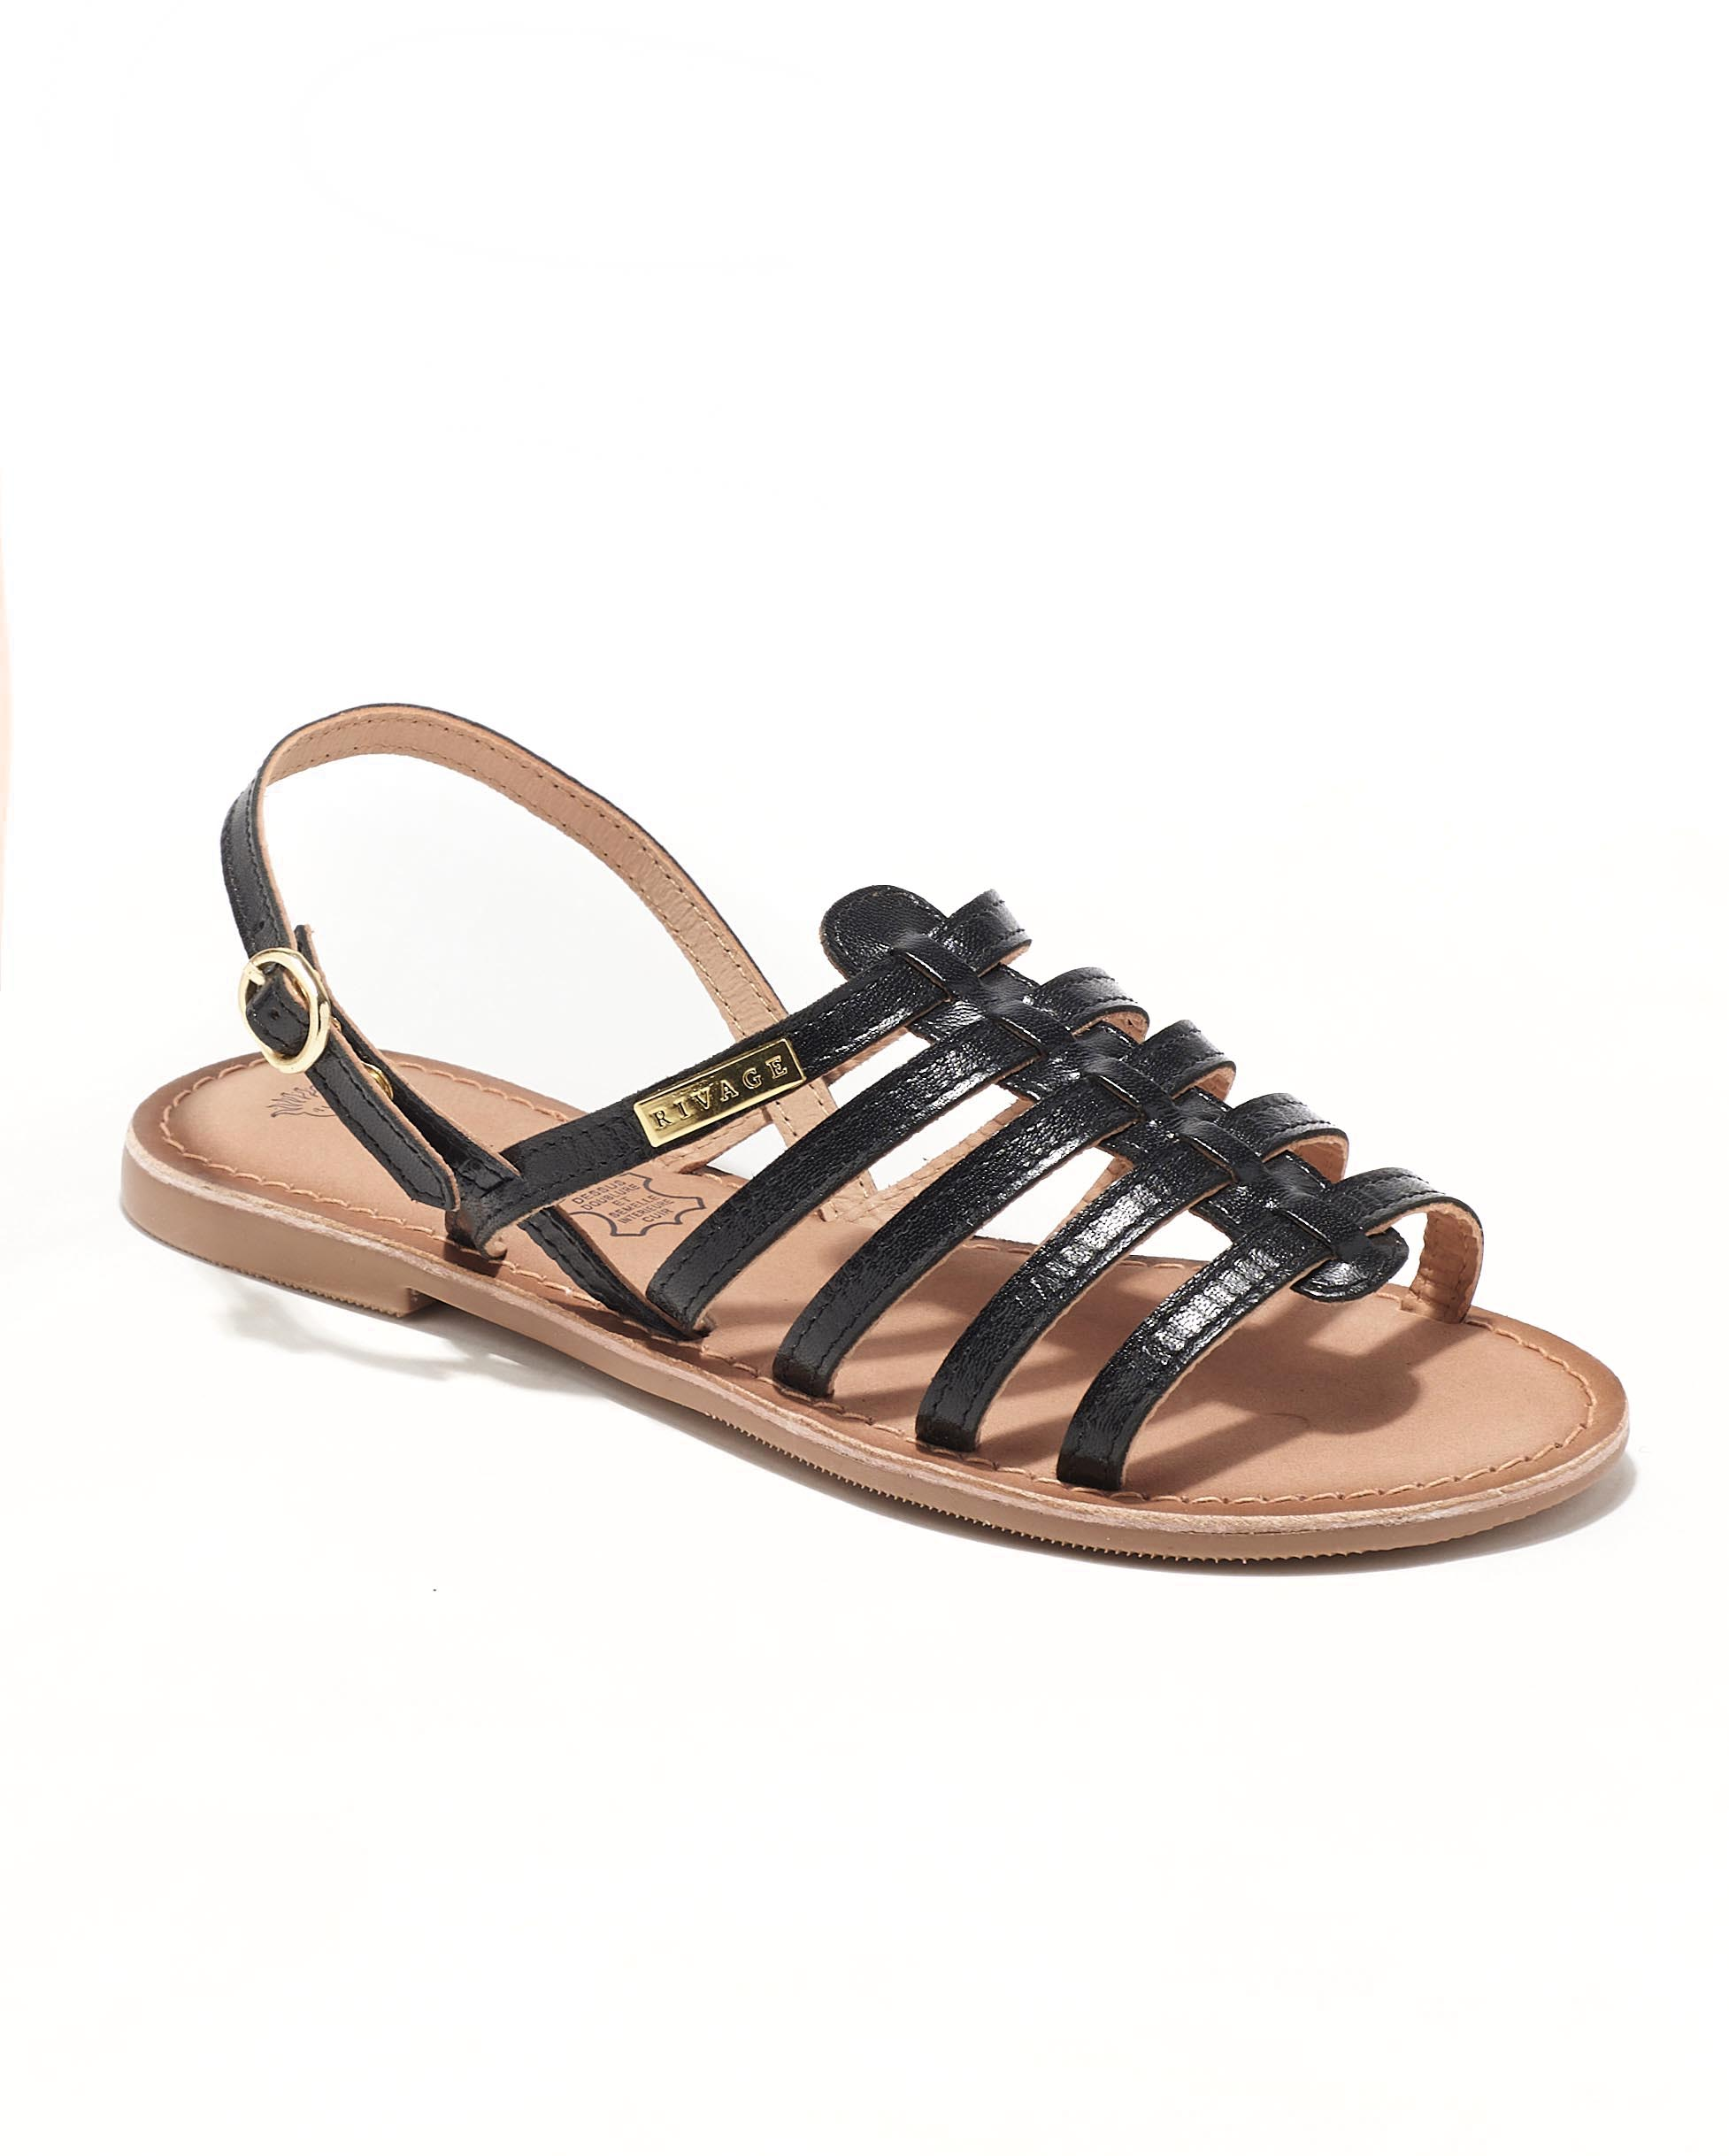 Sandales Plates Femme - Sandale Plate Noir Jina - E-020607